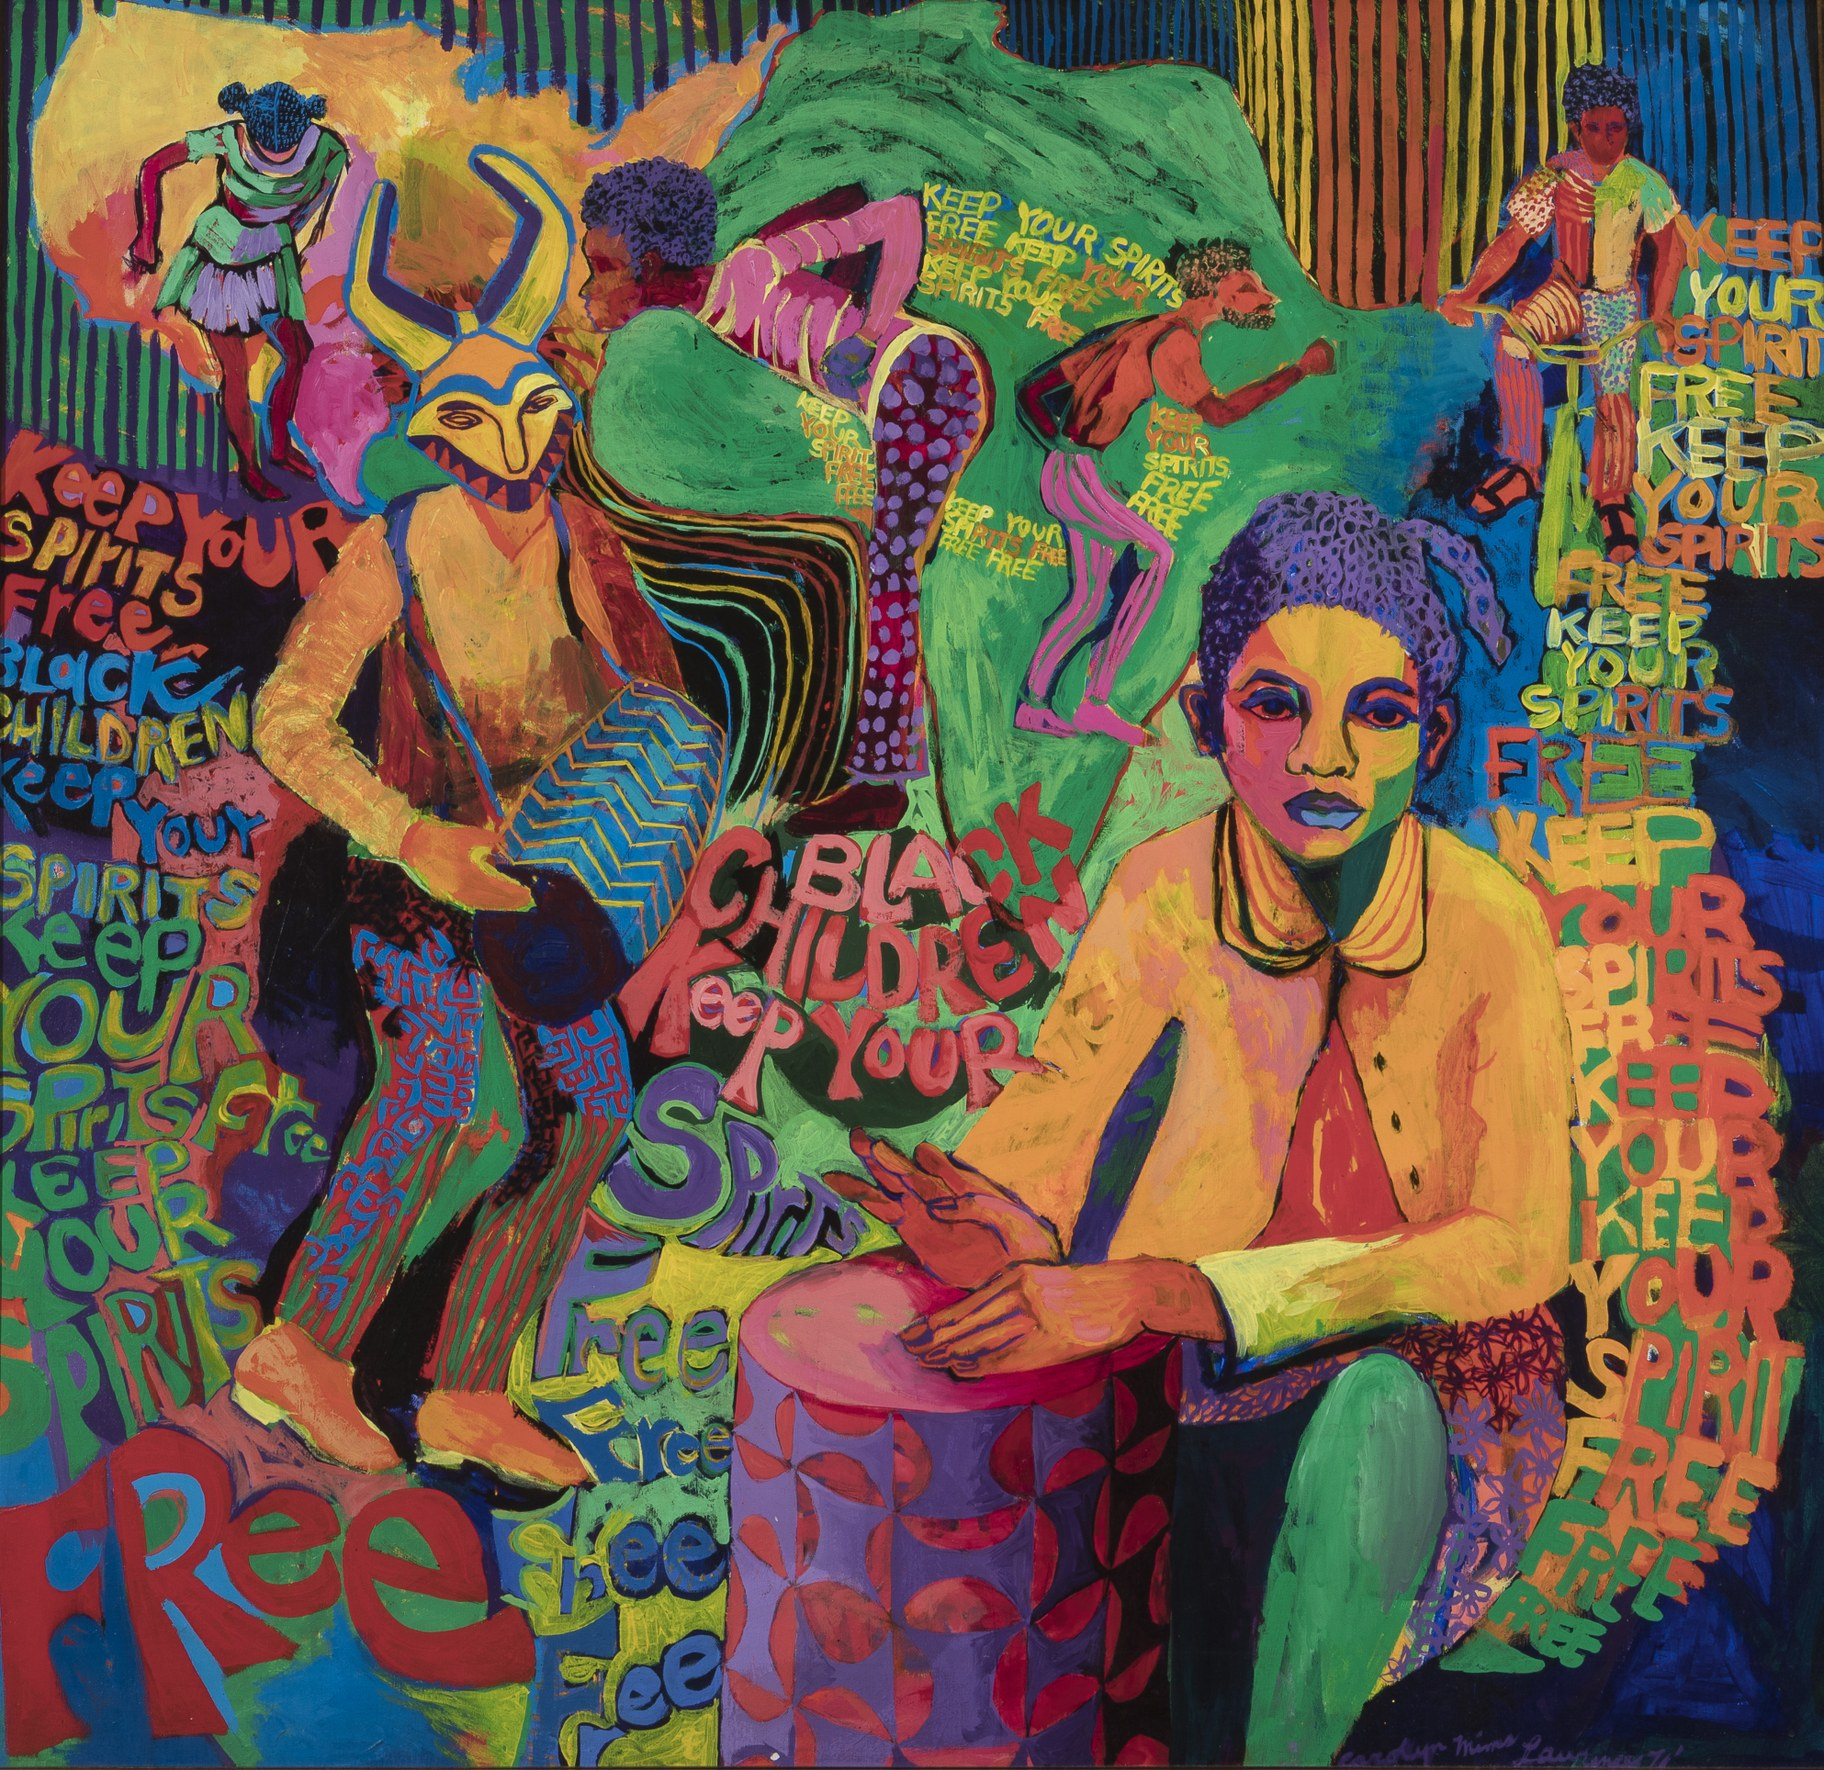 Carolyn Lawrence - Black Children Keep Your Spirits Free_1972.jpg